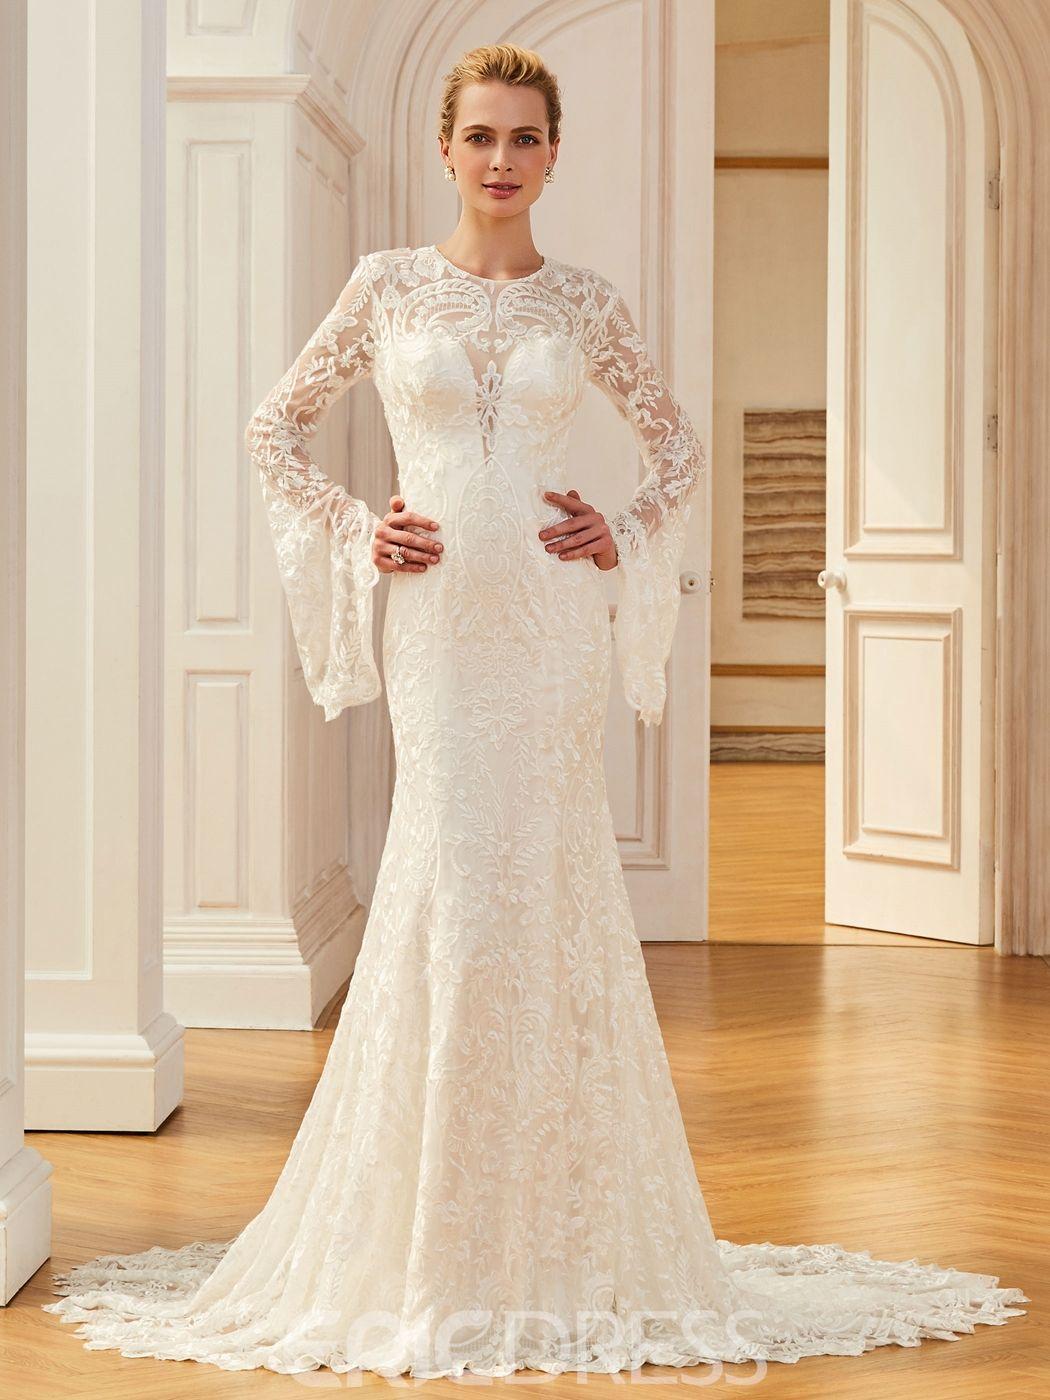 Jewel Mermaid Lace Long Sleevs Wedding Dress | Wedding dress ...